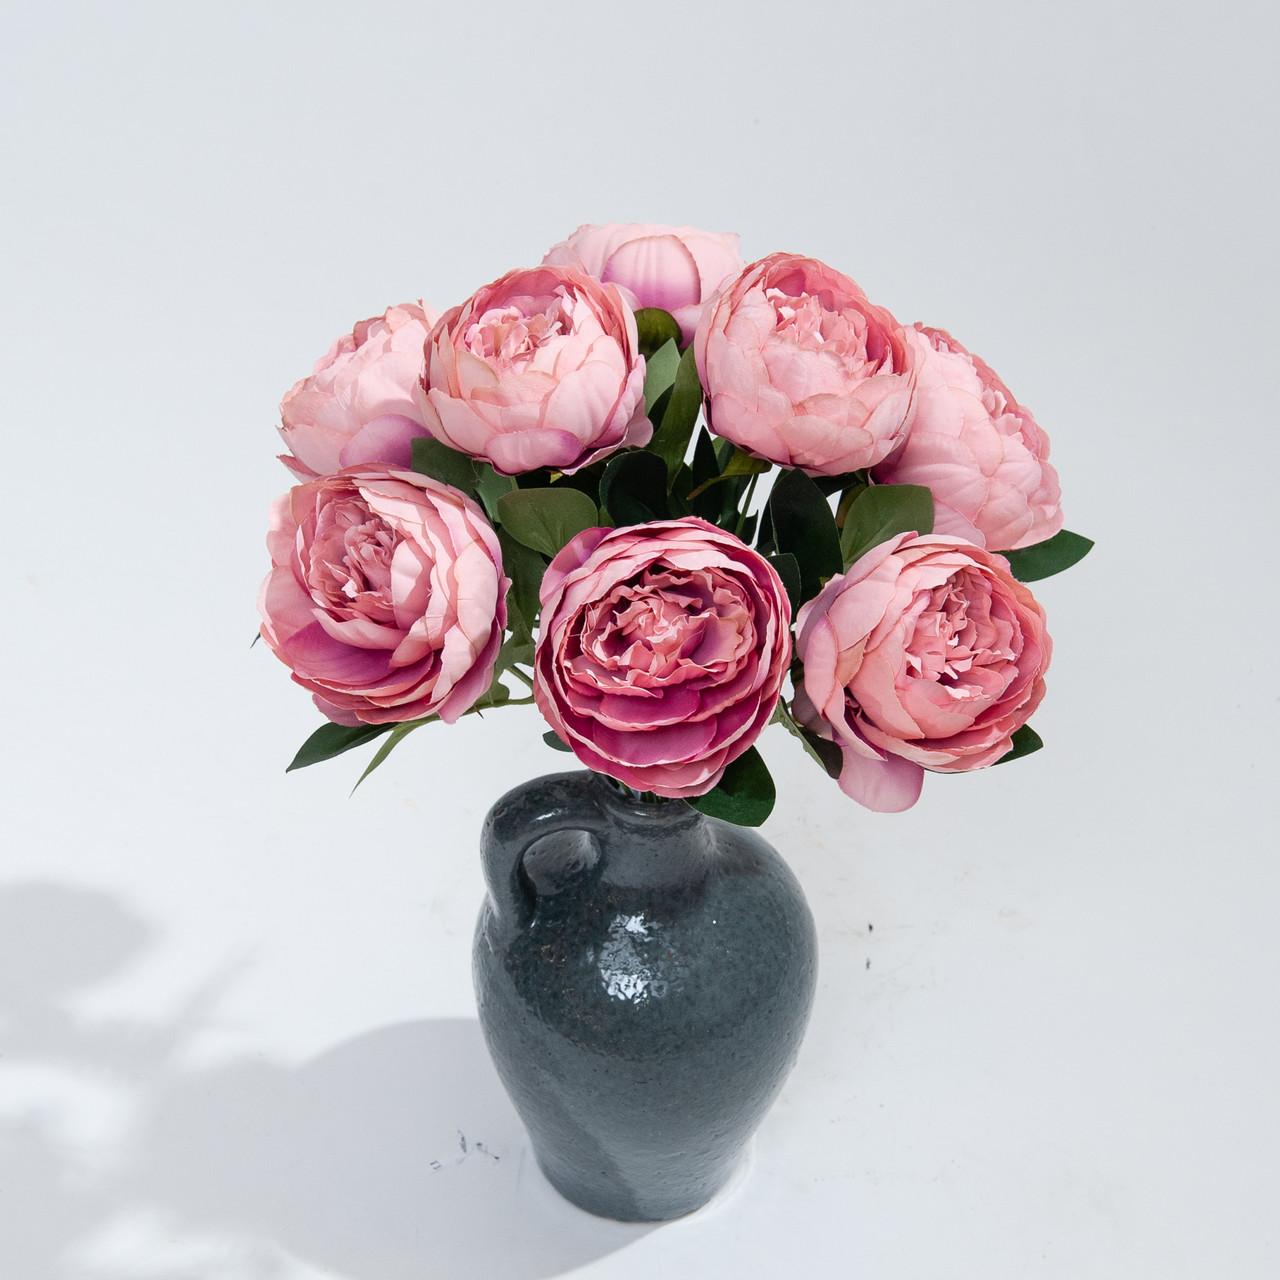 Kunstboeket Pioenrozen 43 cm oud-roze